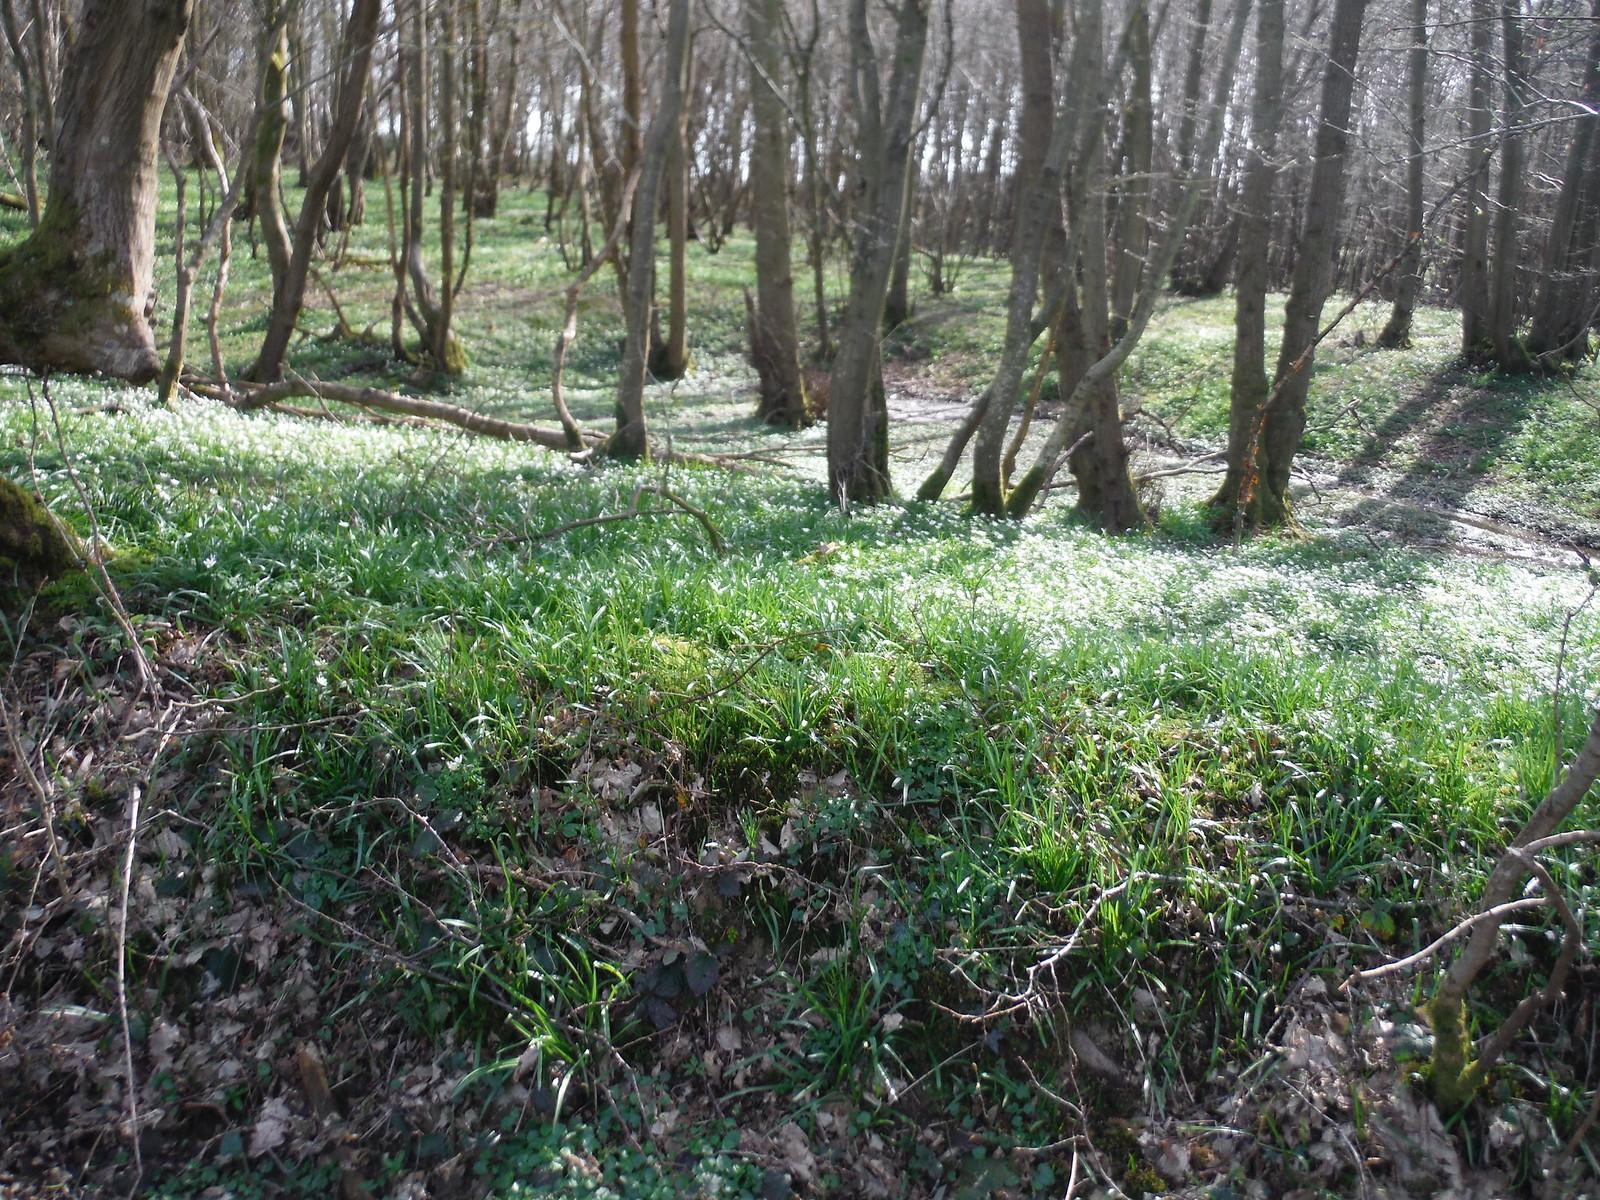 Wood Anemones in Sandpits Wood, Horsted Keynes SWC Walk 27 - East Grinstead to Wivelsfield or Sheffield Park